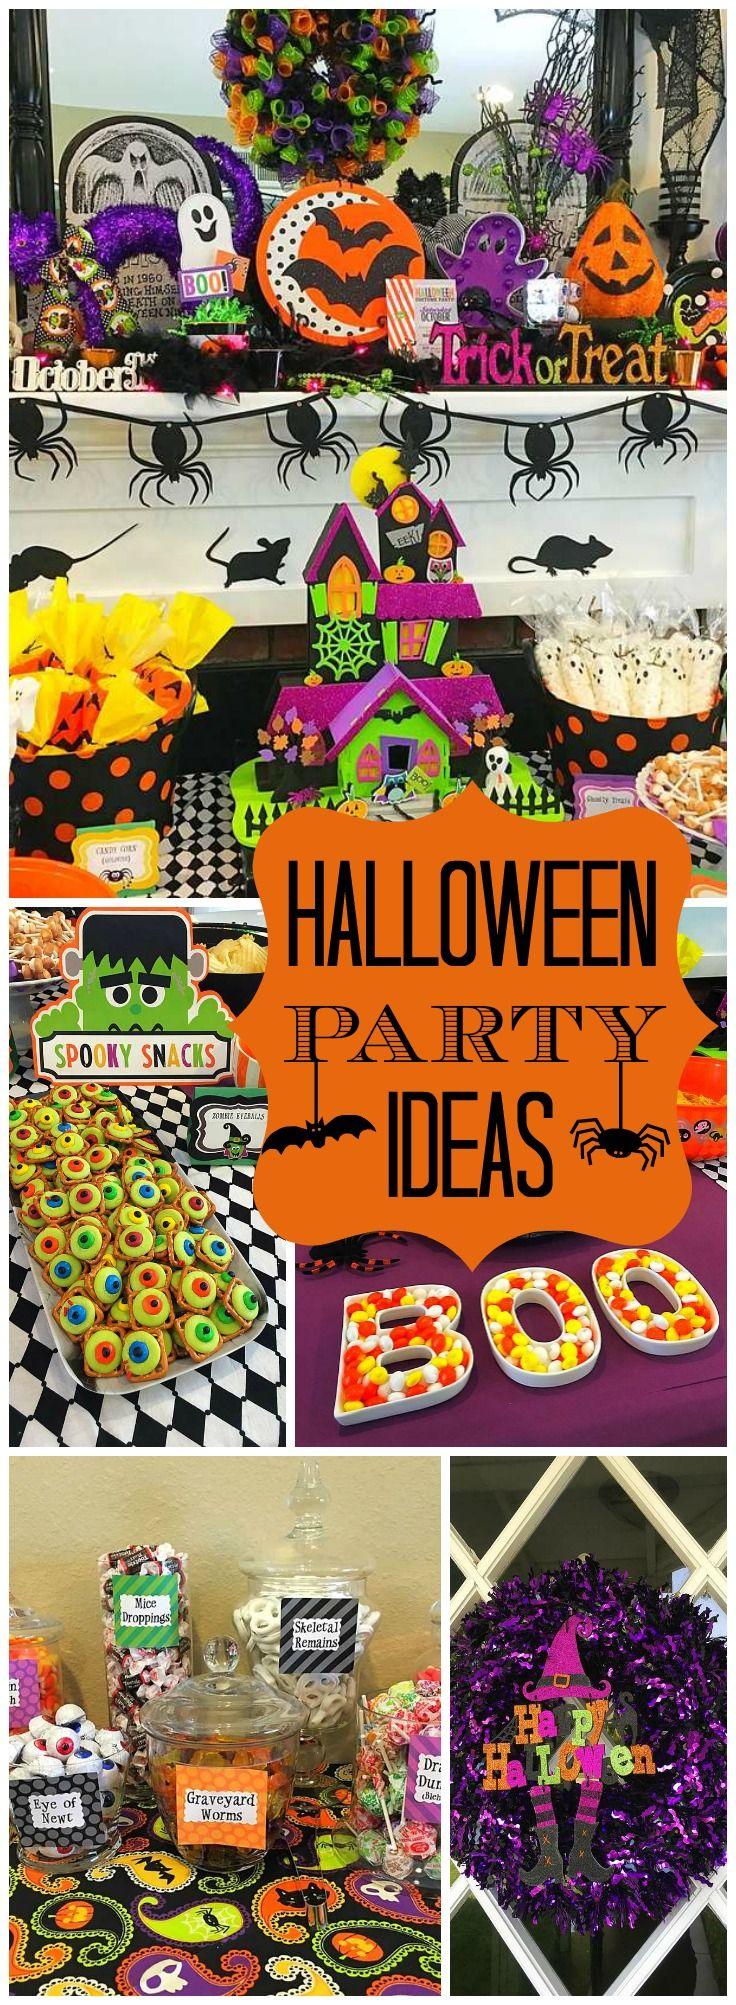 2666 best halloween images on Pinterest